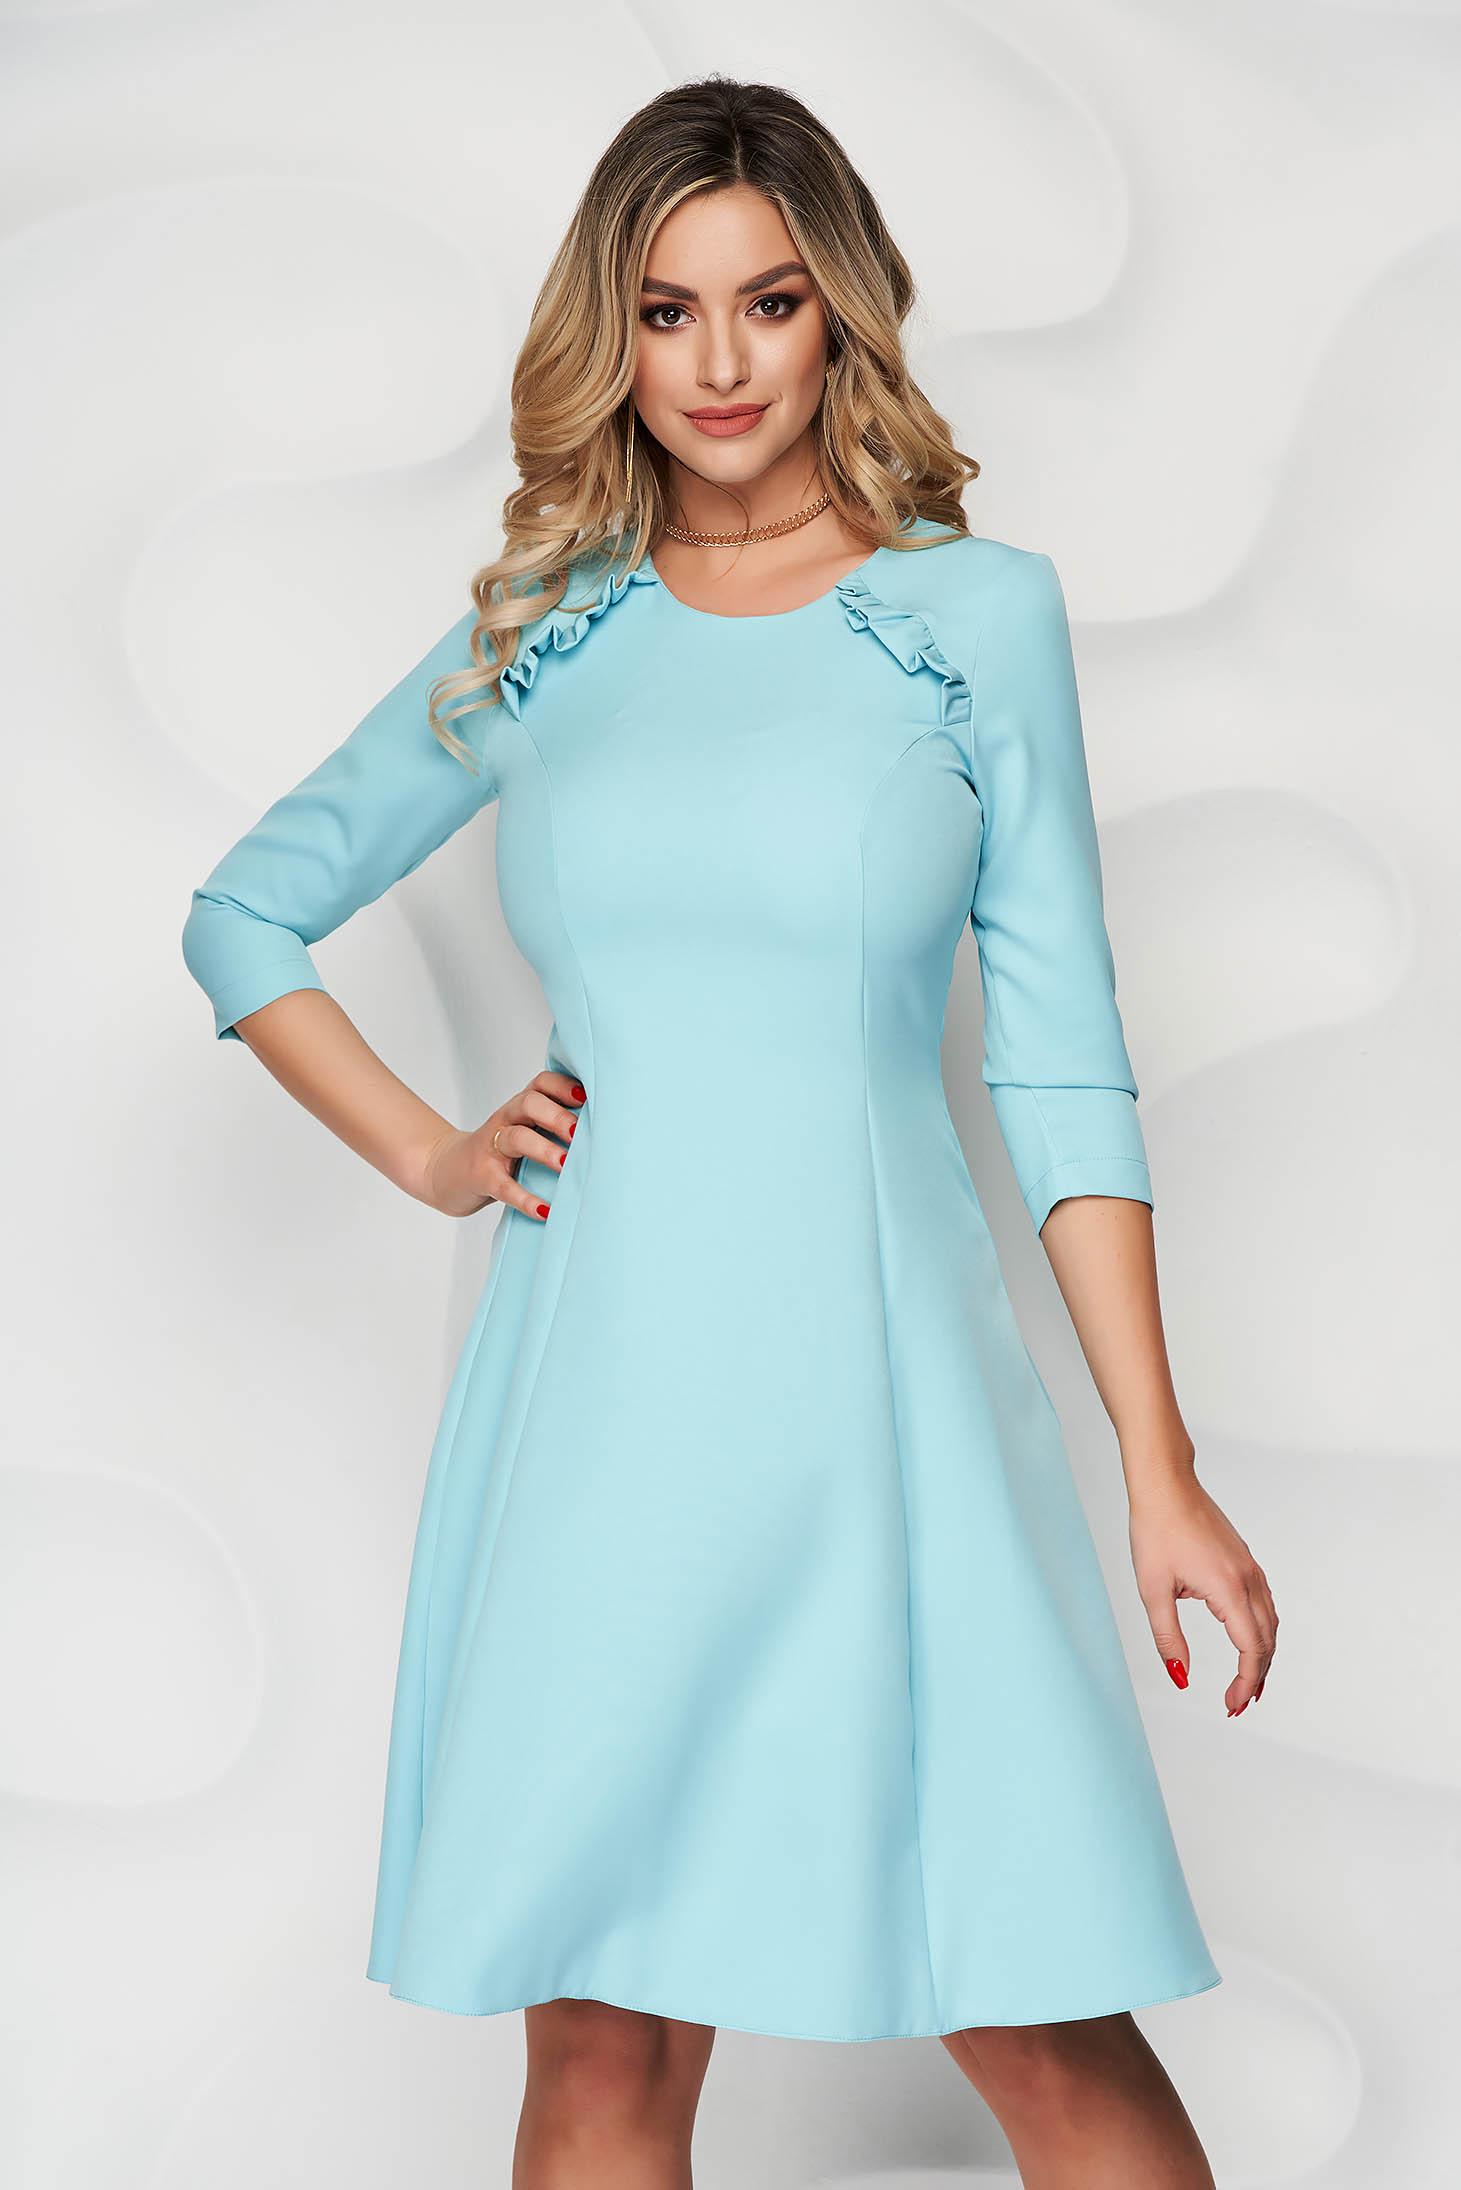 Rochie StarShinerS albastru aqua office midi in clos din stofa usor elastica cu volanase